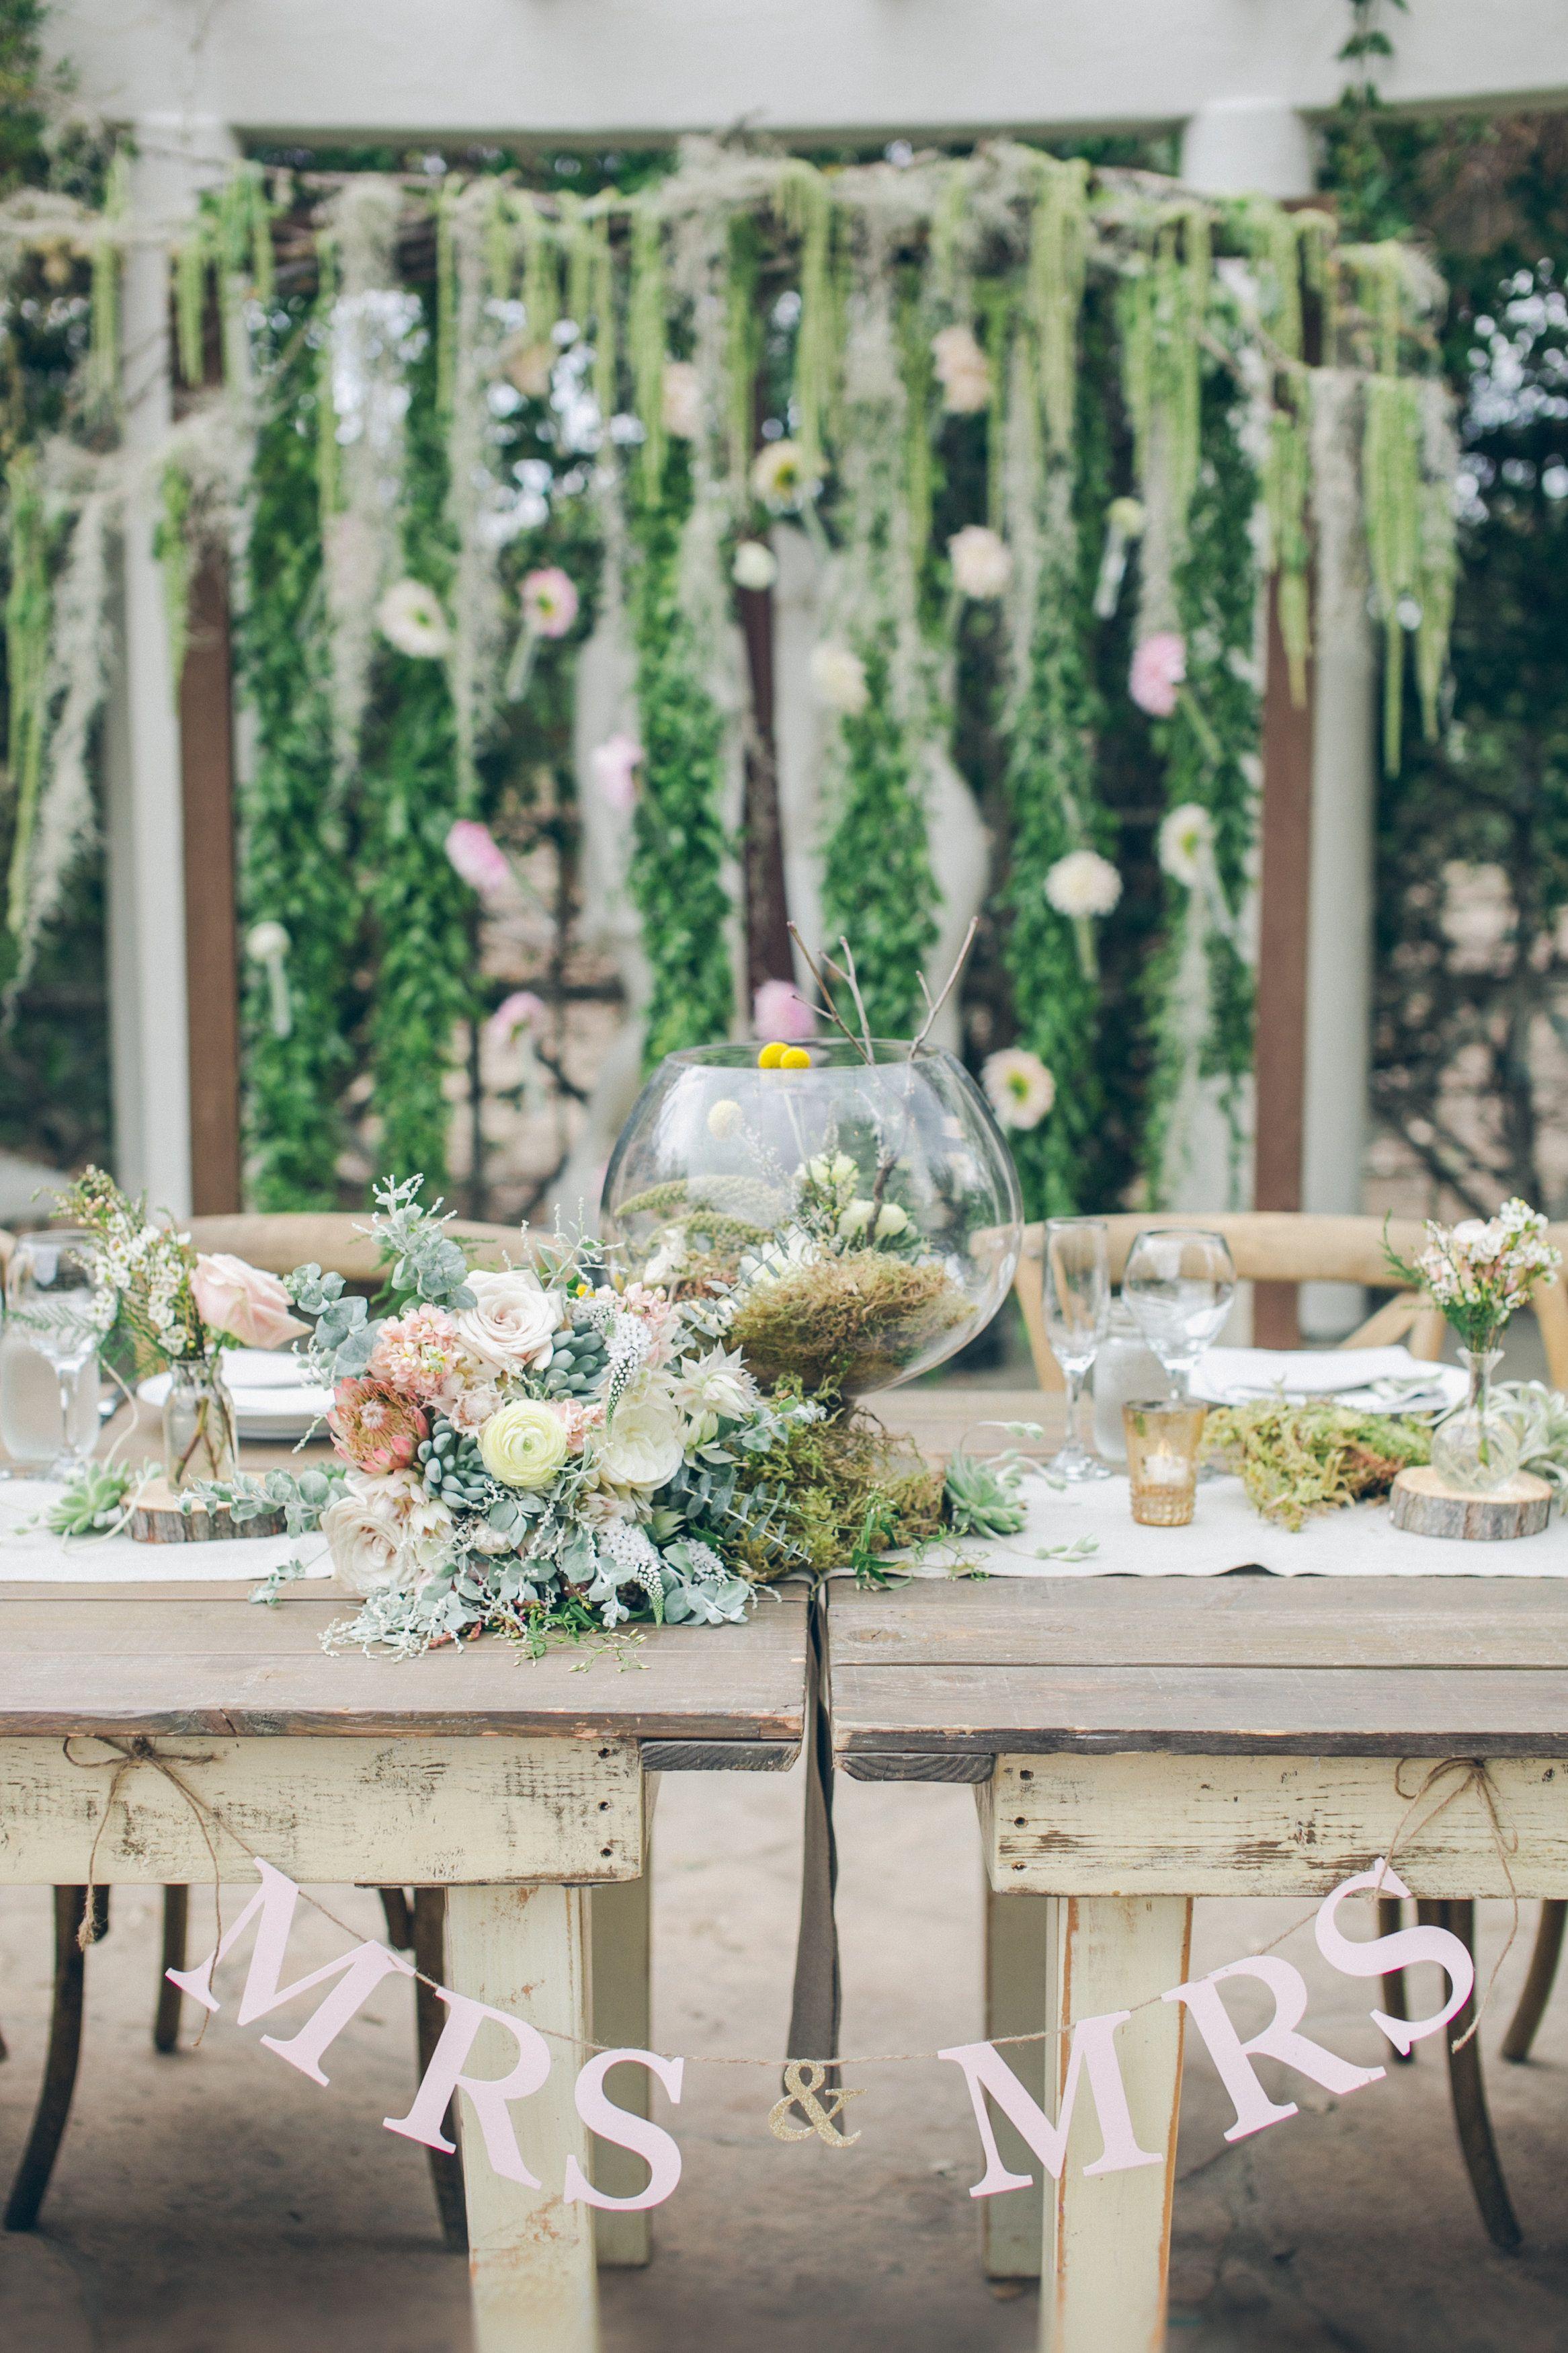 Rustic Summer Wedding at Orcutt Ranch | Summer wedding ...